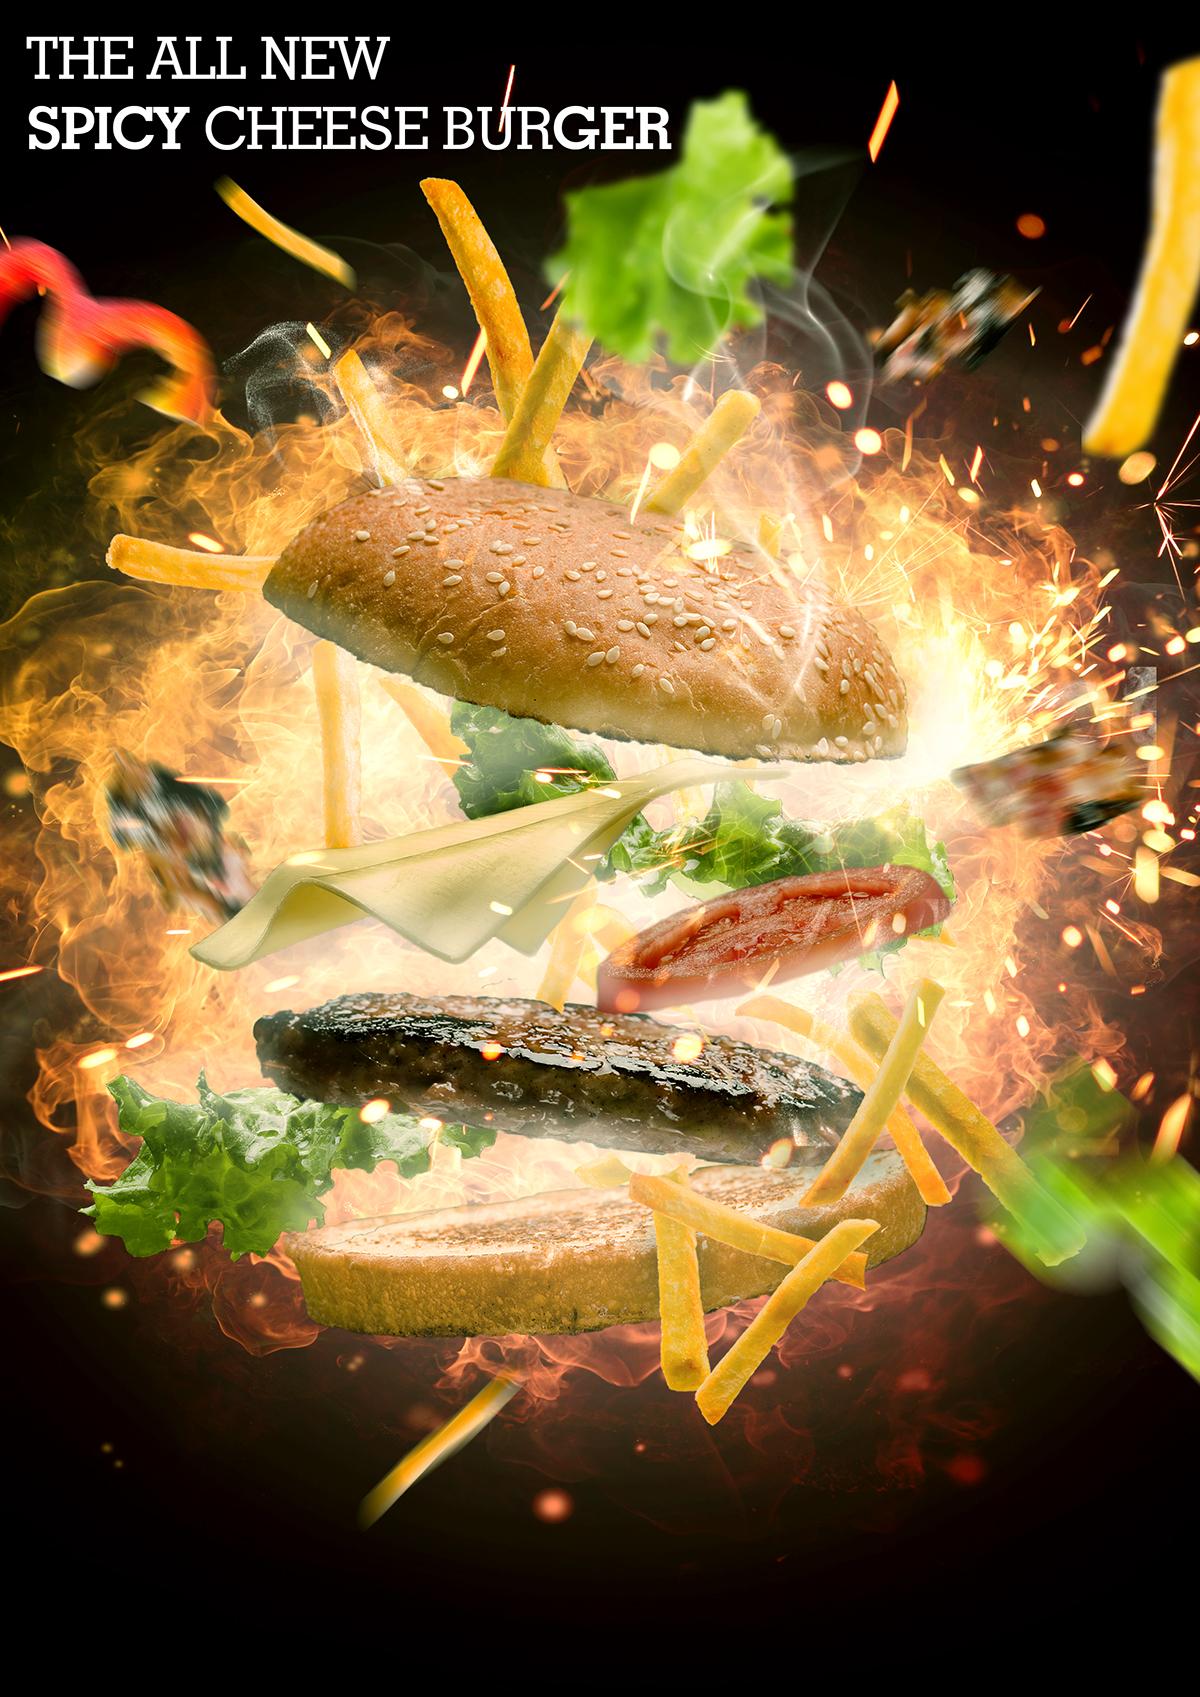 Advertising  manipulation artwork art direction  Food  graphic design  posters concepts Digital Art